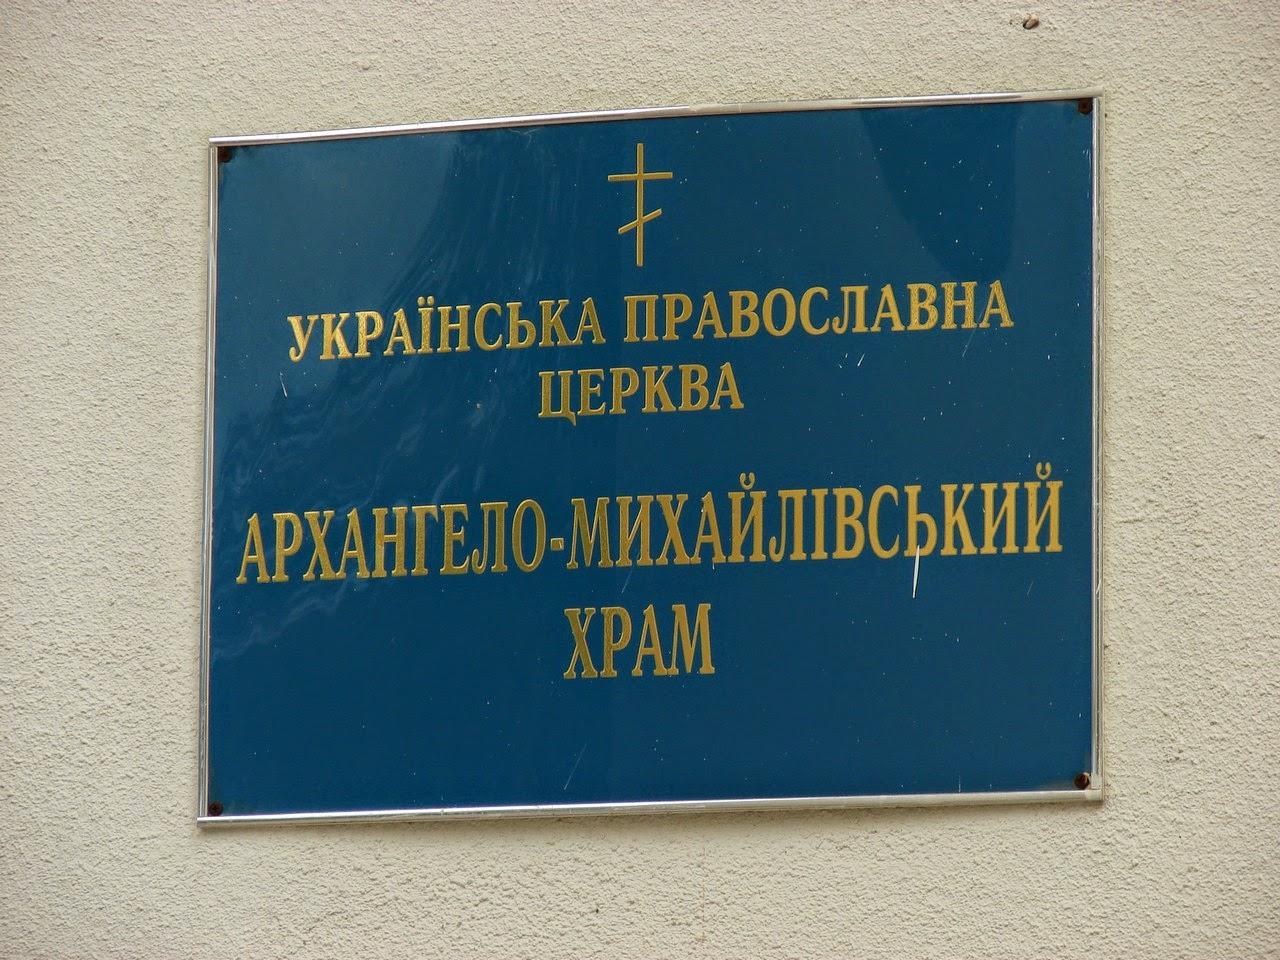 Название церкви